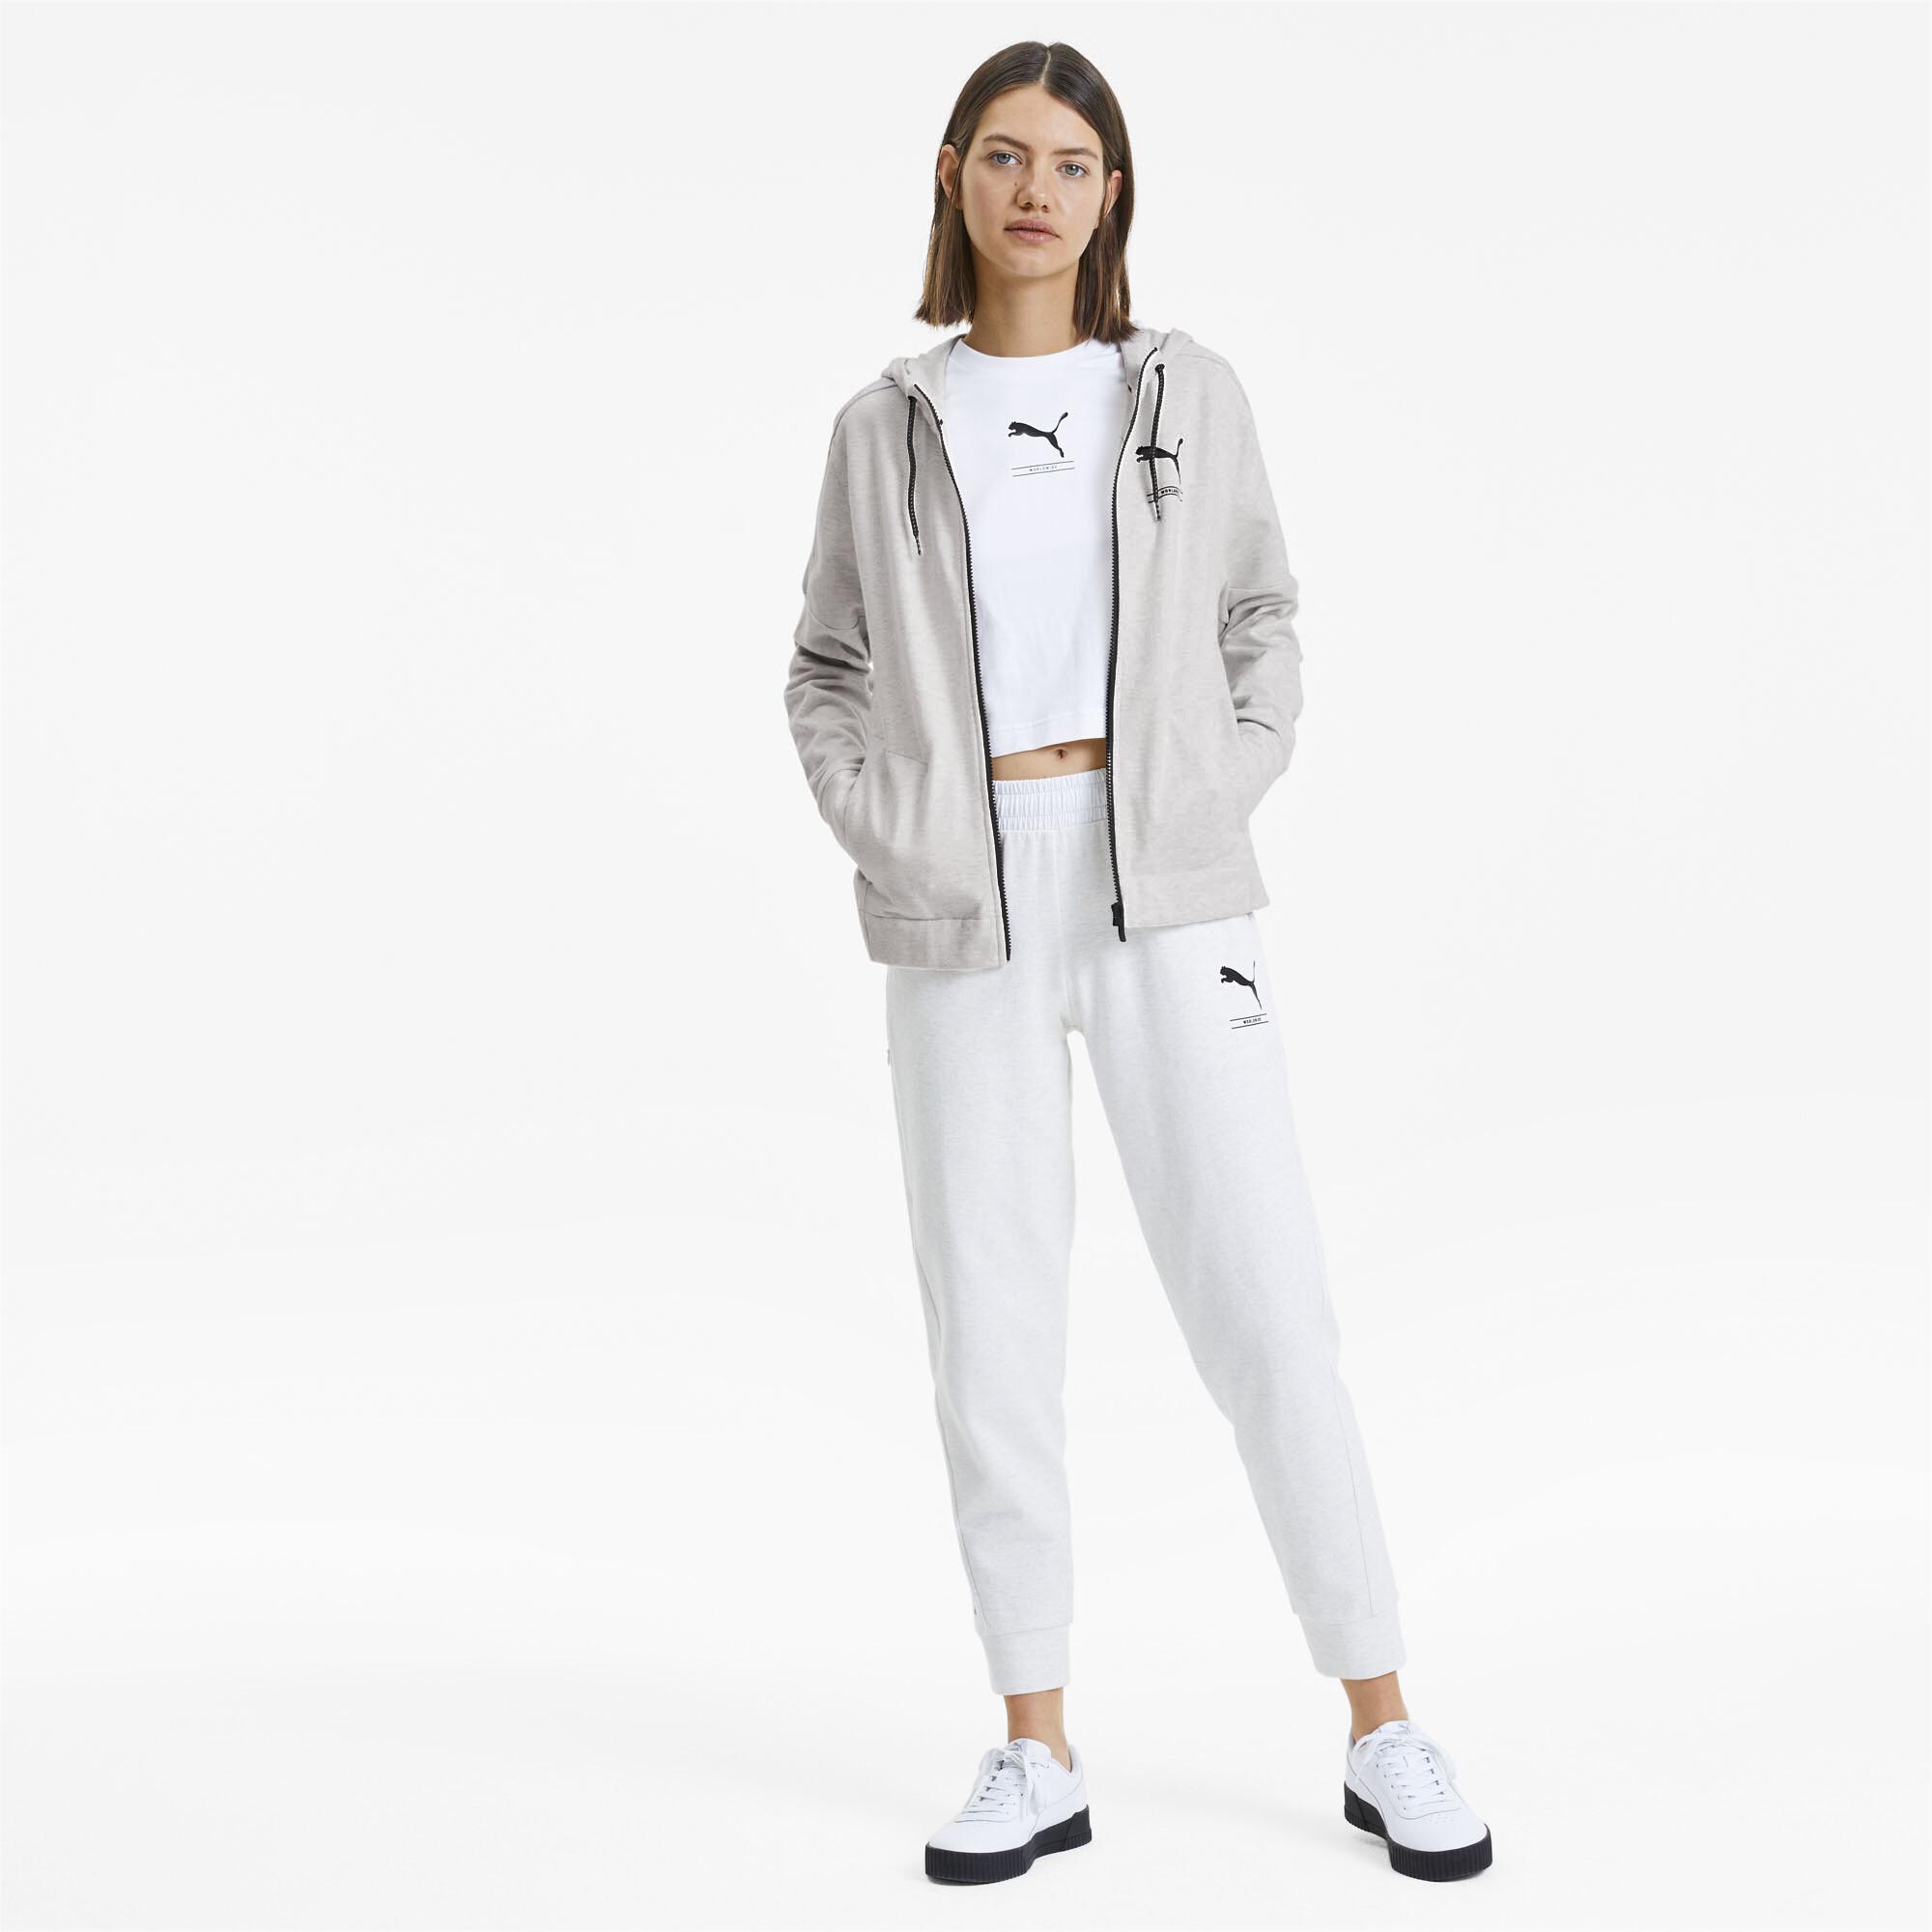 PUMA-NU-TILITY-Women-039-s-Full-Zip-Hoodie-Women-Sweat-Basics miniatuur 17